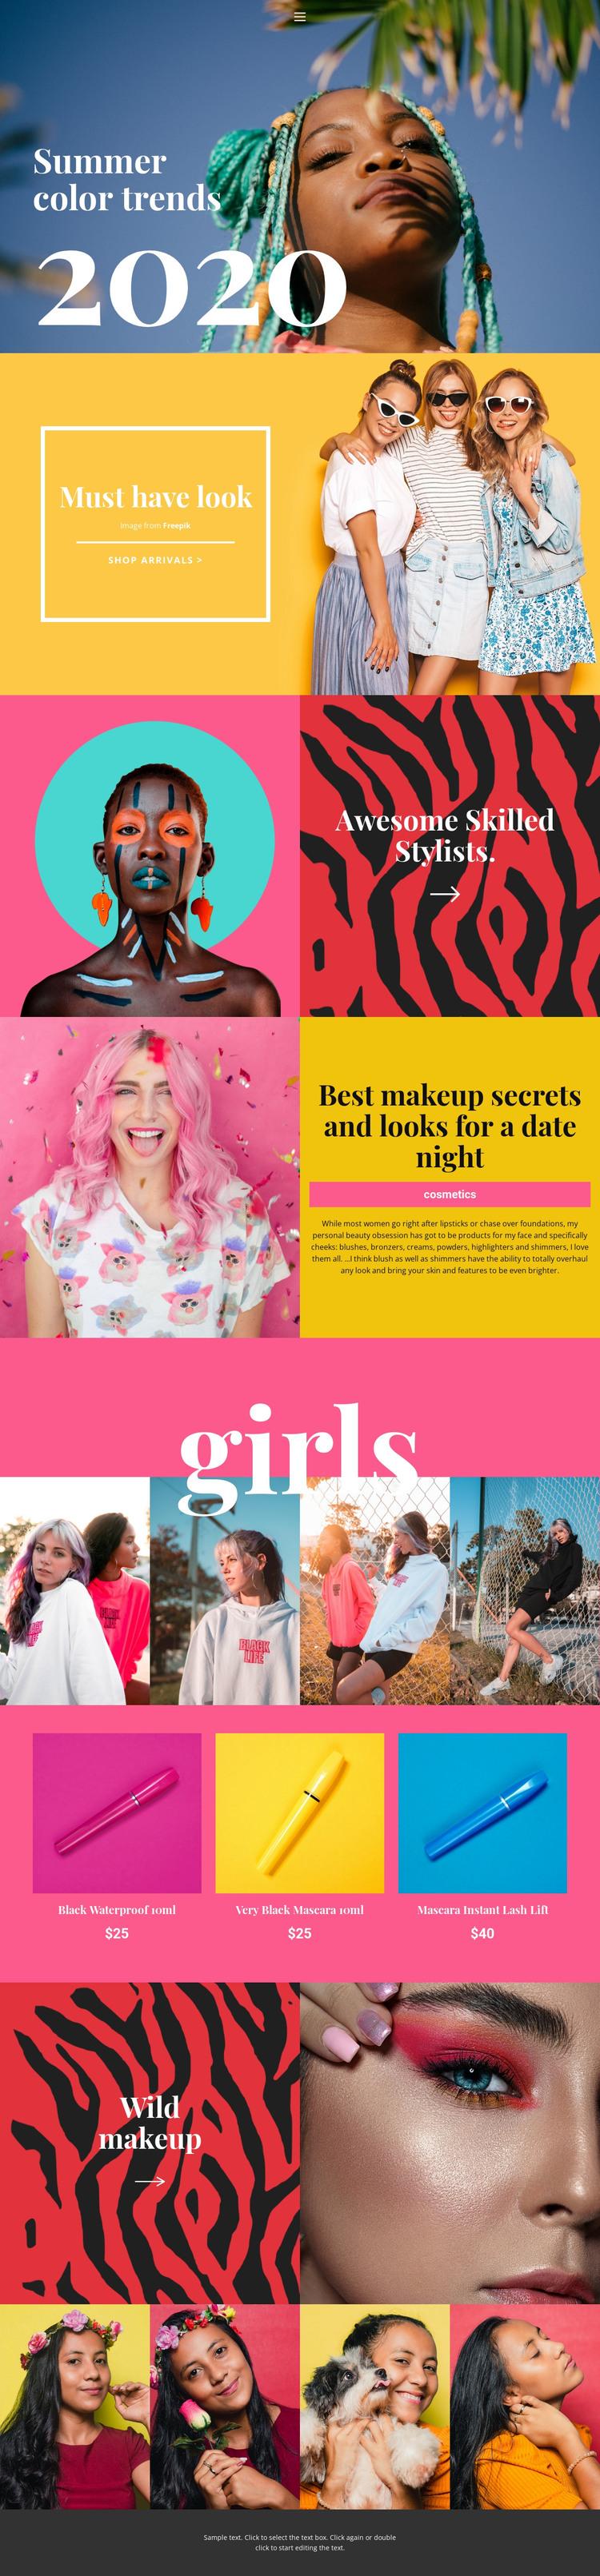 Beauty trends info HTML Template